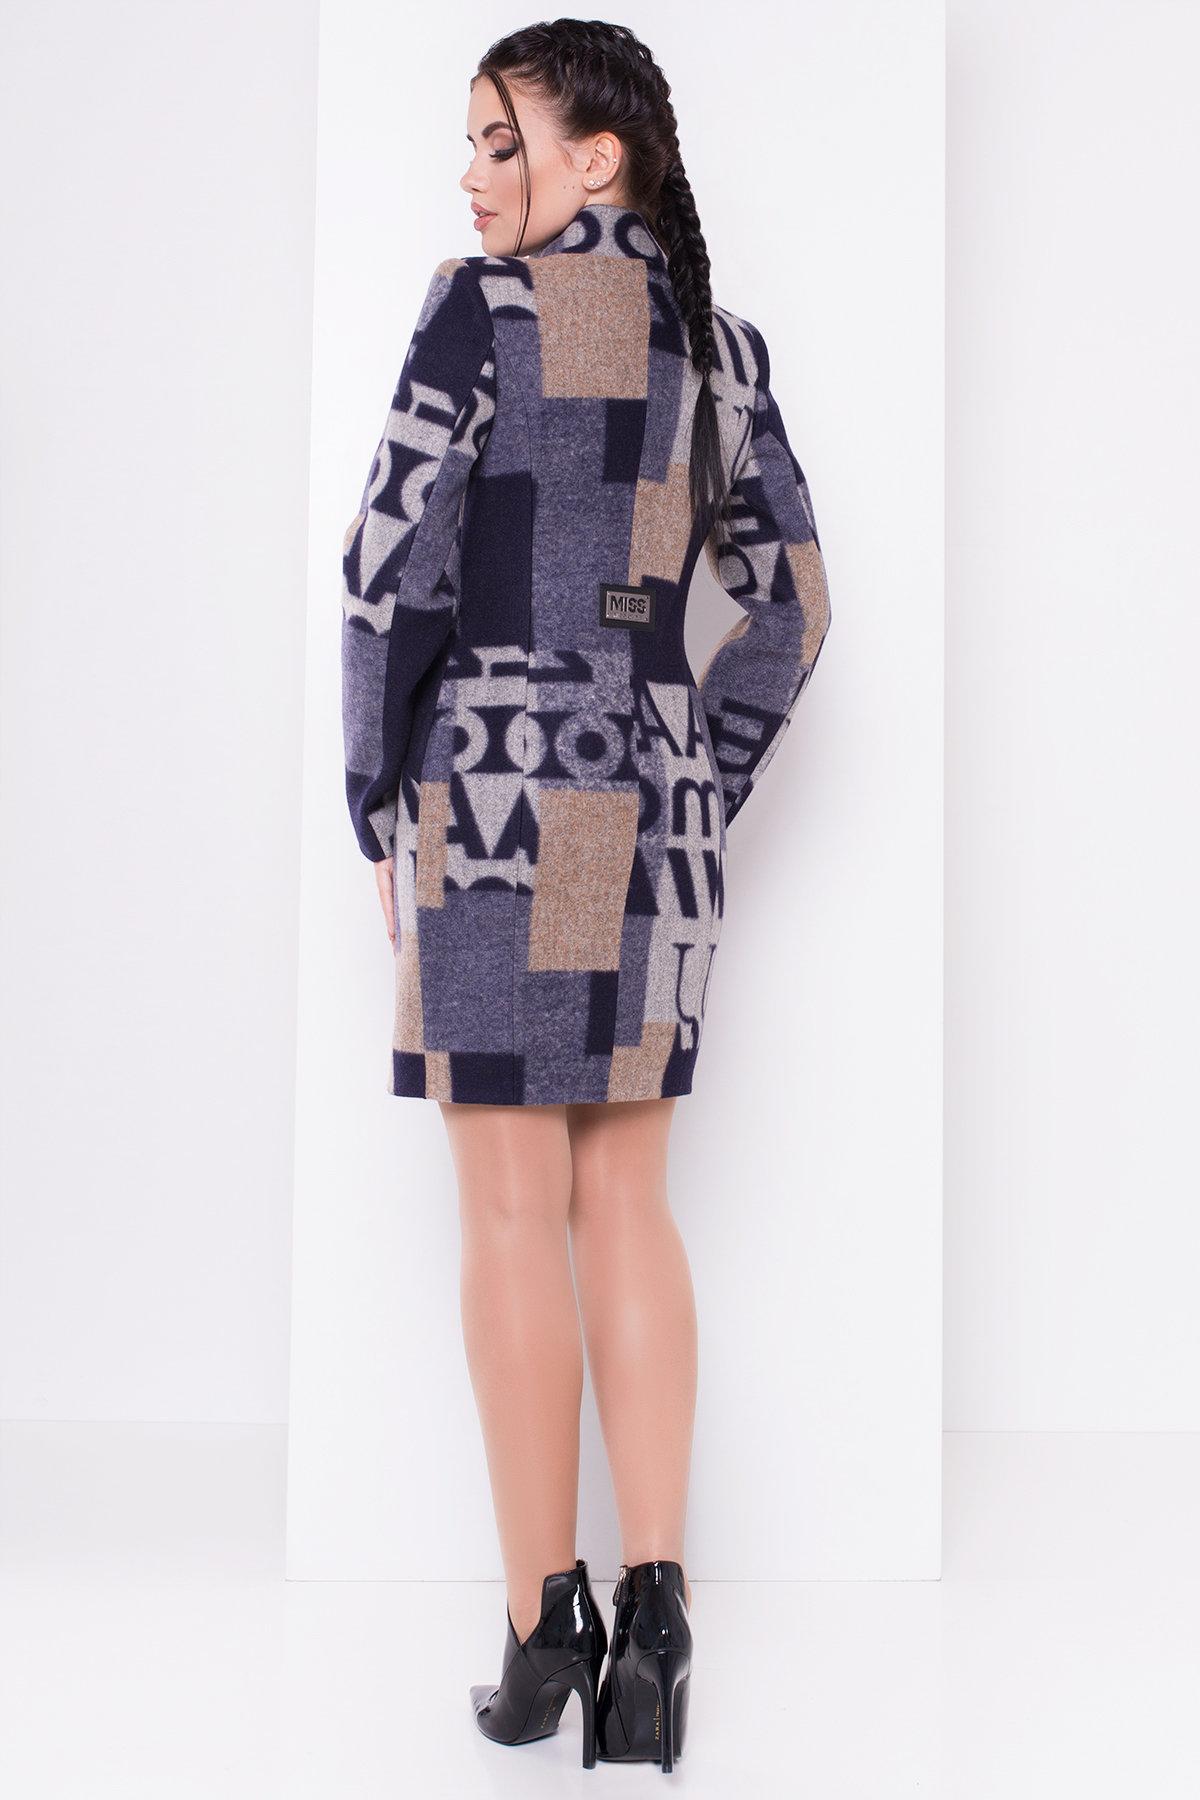 Пальто Луара 0505 Цвет: Тёмно-синий/серый Буквы Д5/С2